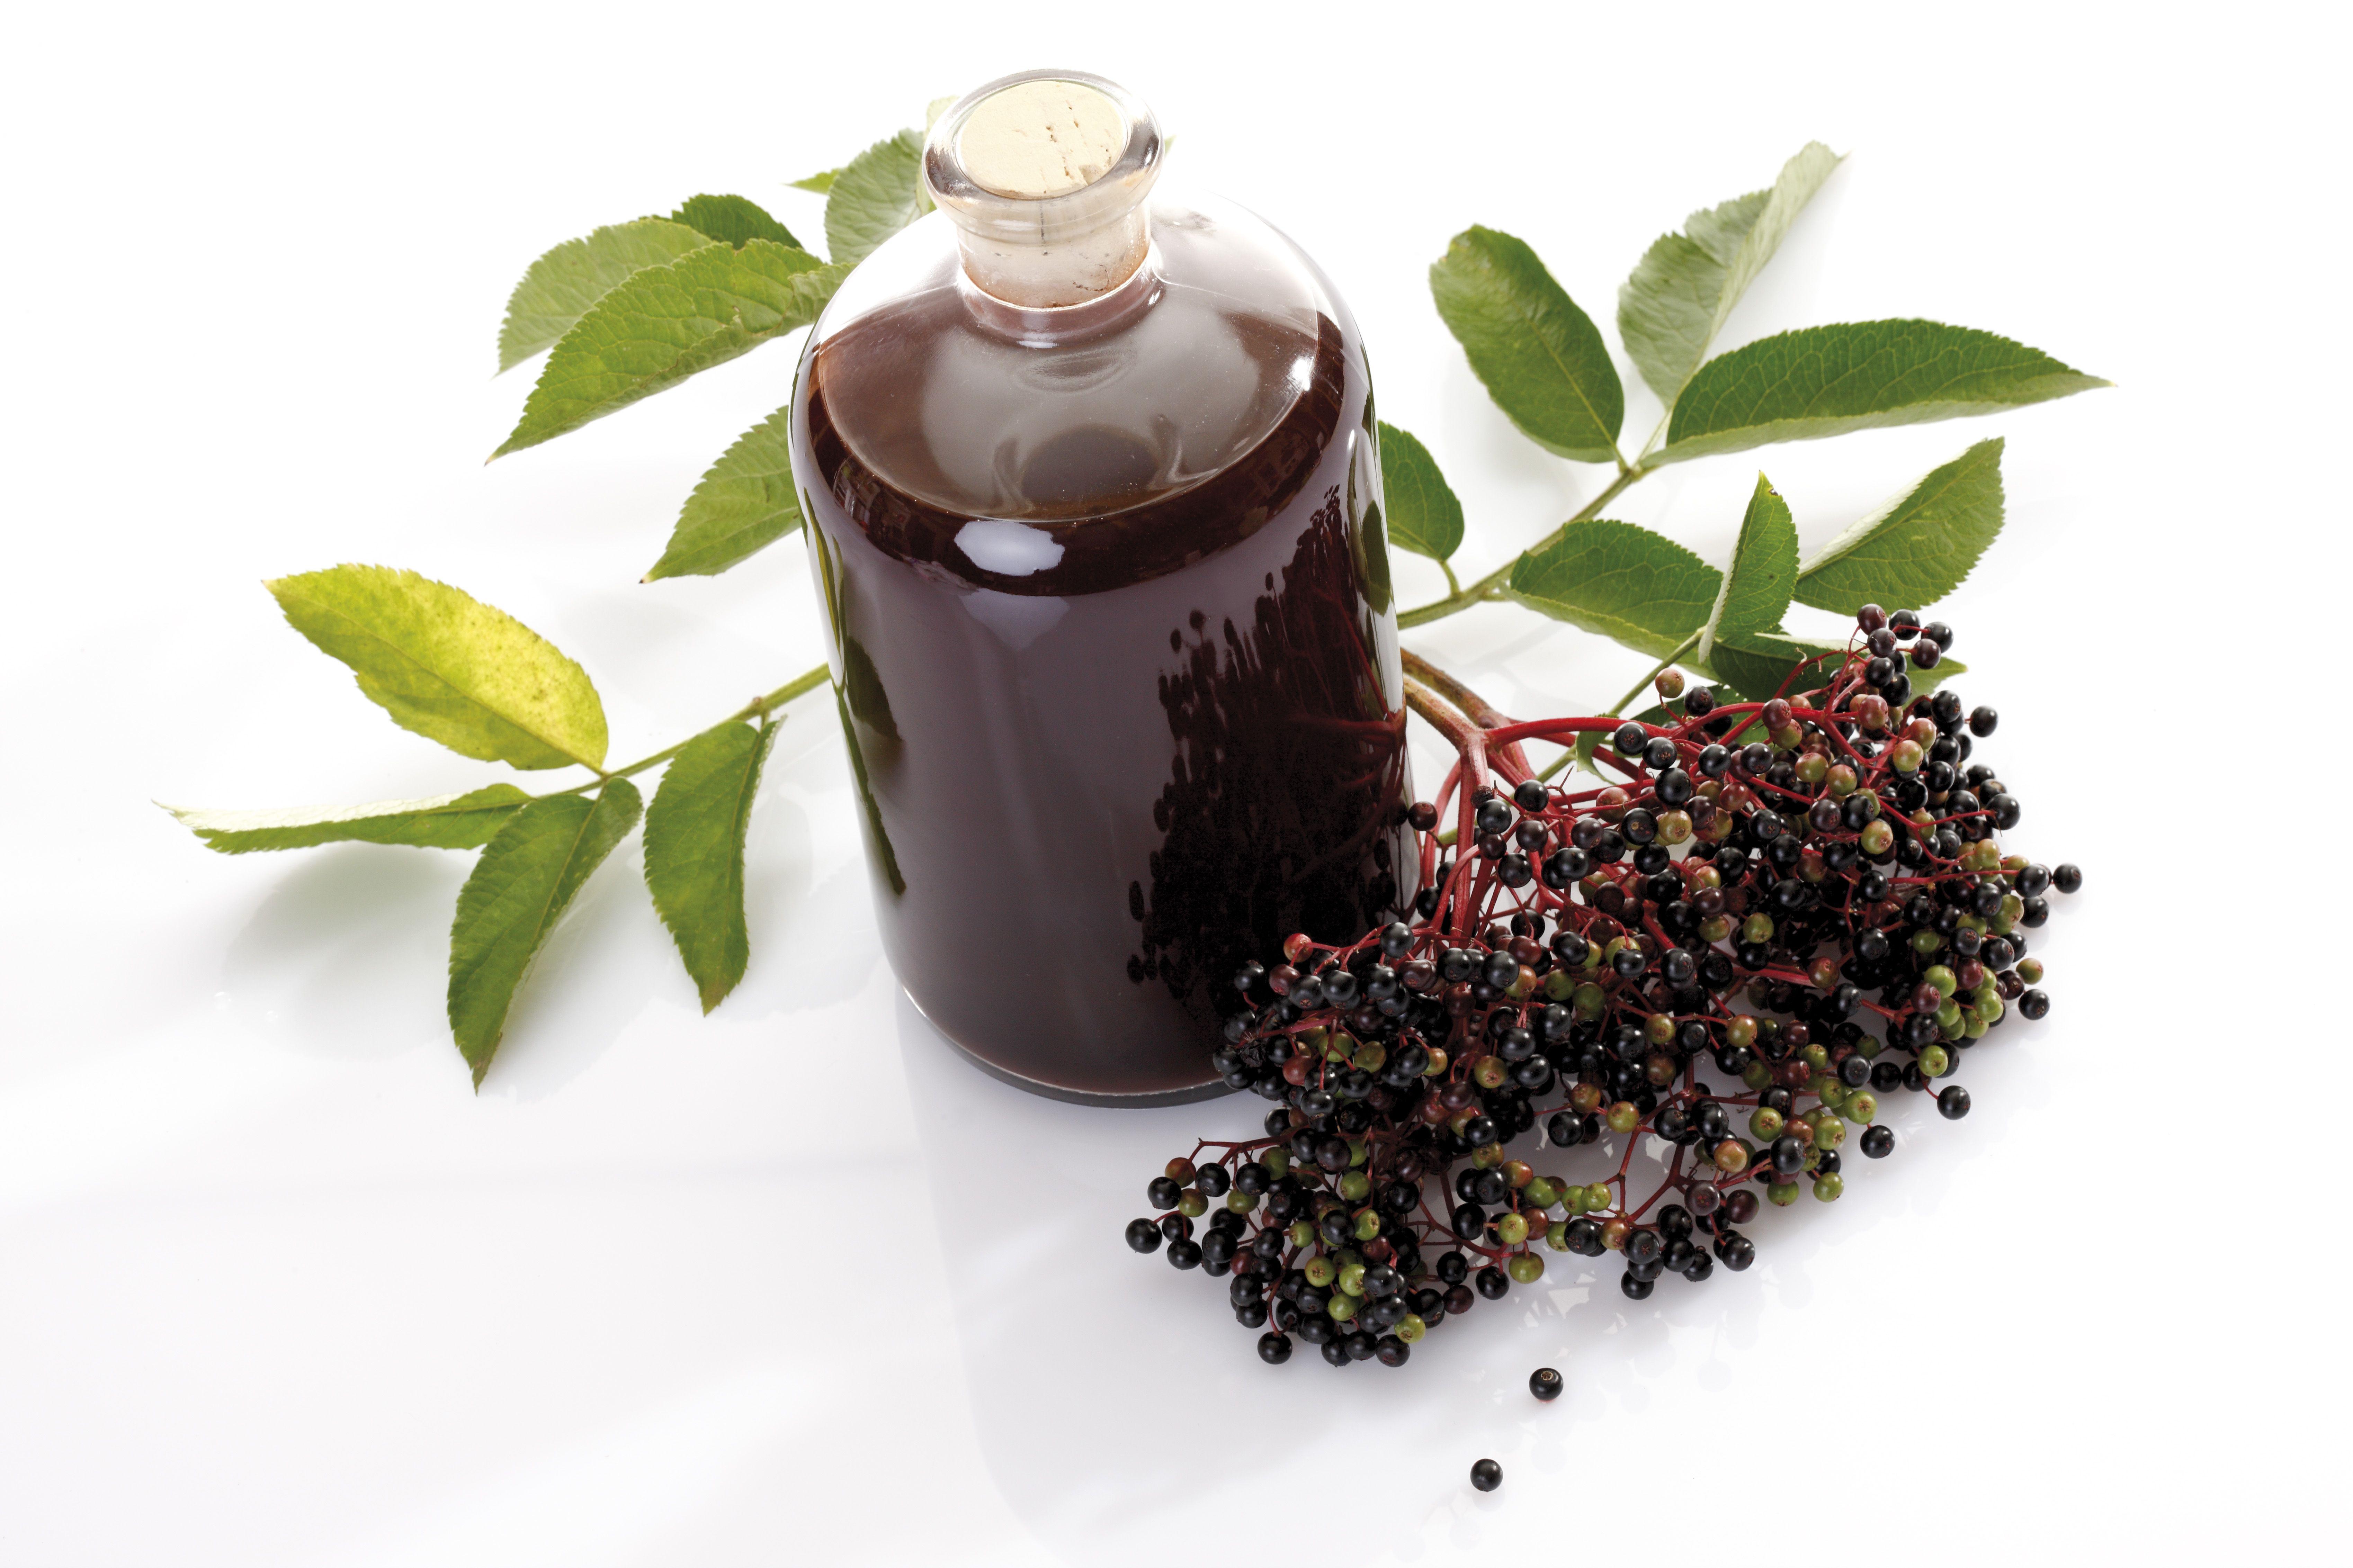 Elderberry wine and black elder (Sambucus nigra), elevated view